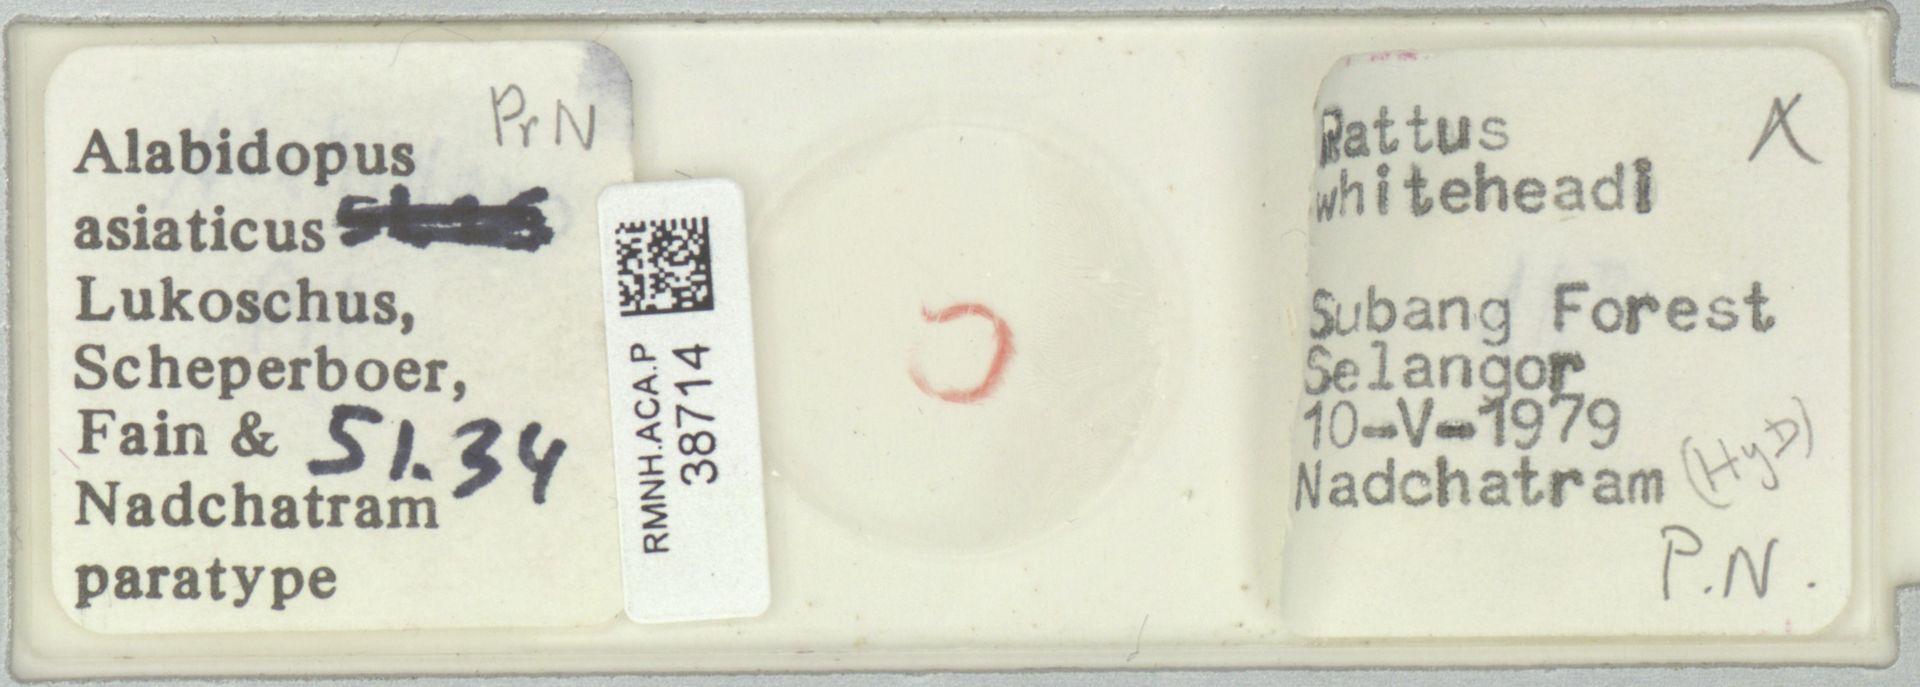 RMNH.ACA.P.38714 | Alabidopus asiaticus Lukoschus, Scheperboer, Fain & Nadchatram